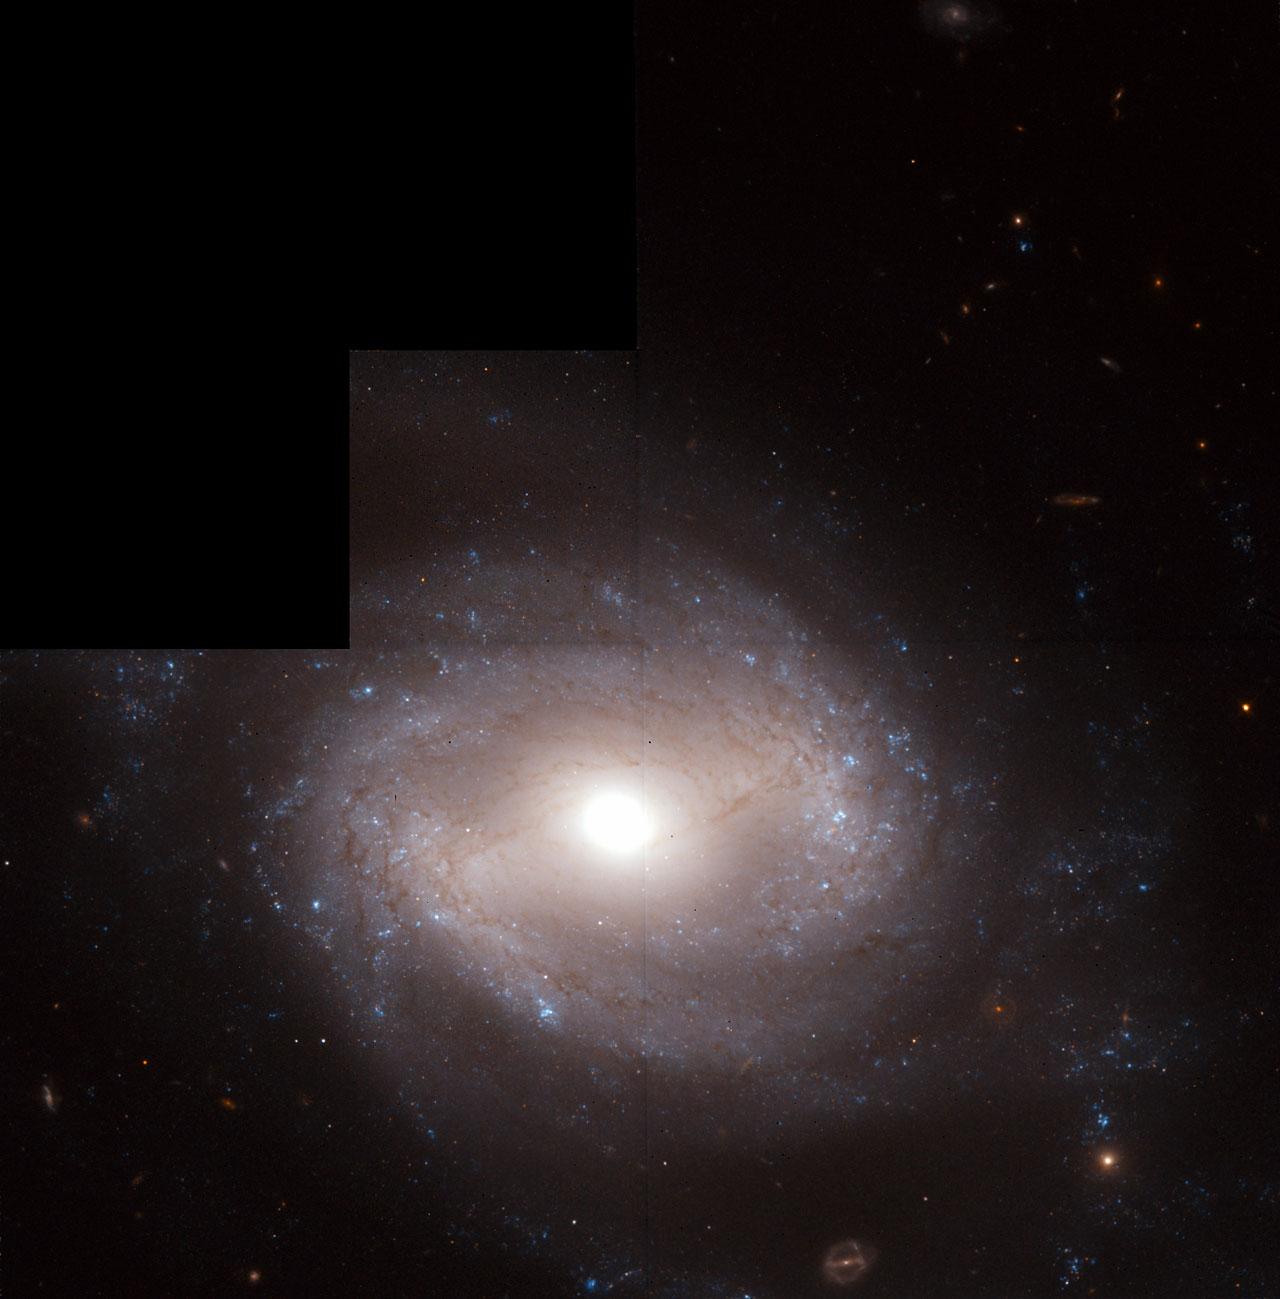 Distance Measurements to a Type-Ia Supernova-Bearing Galaxy